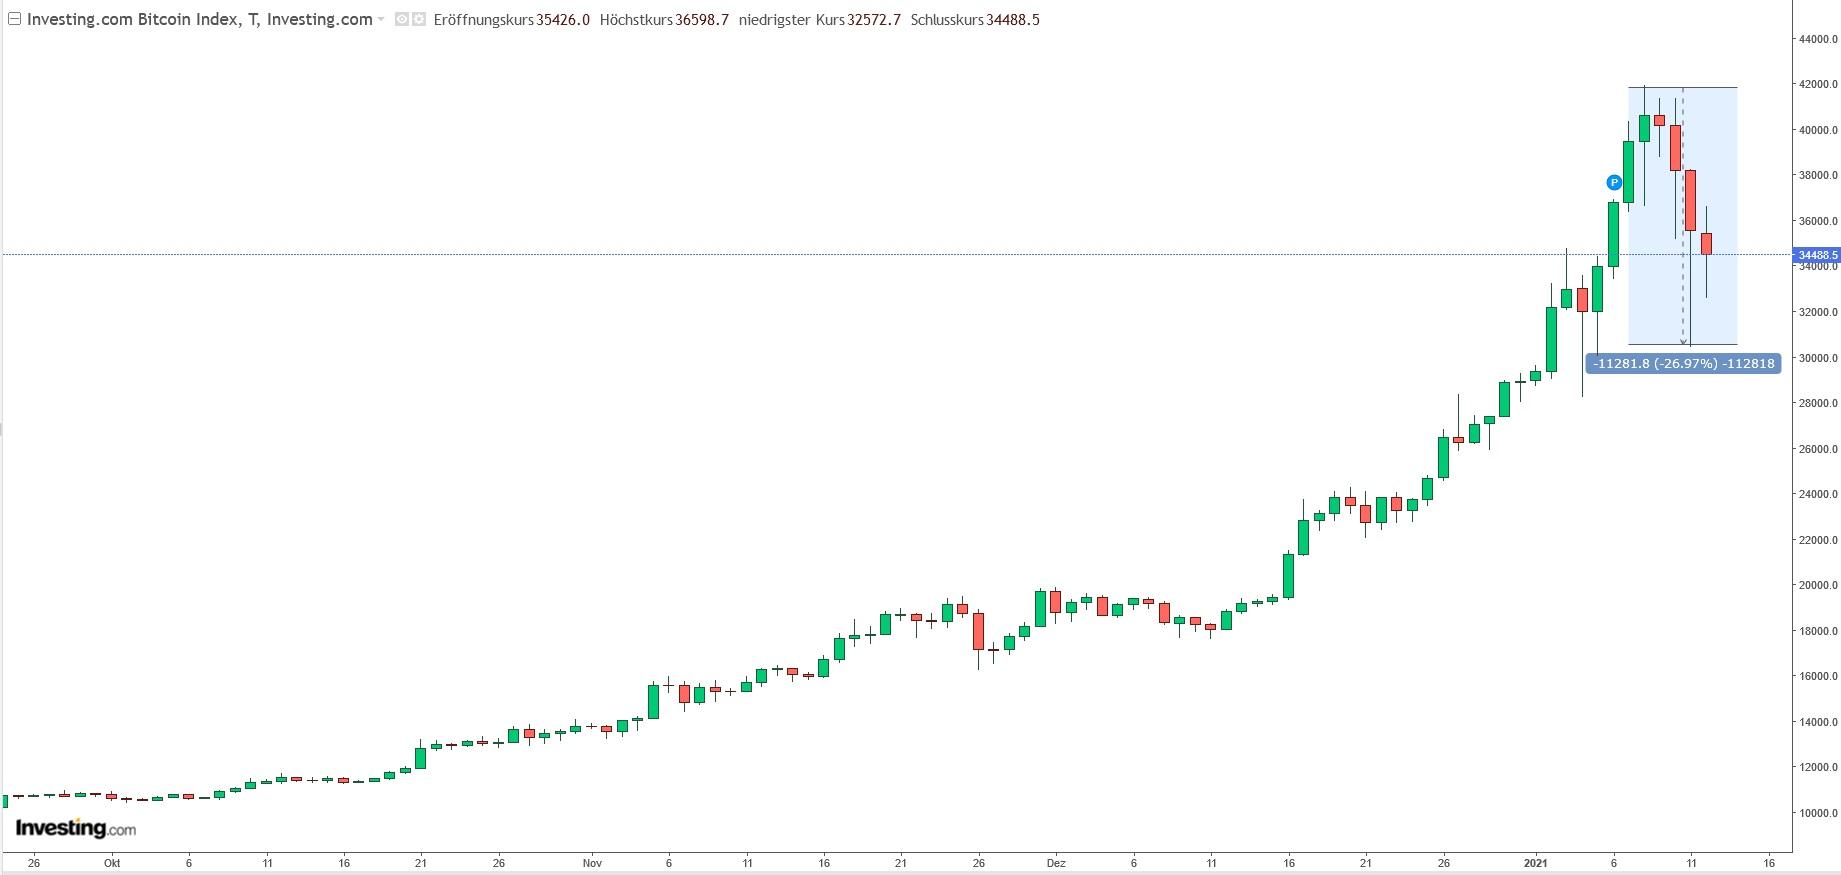 Kursentwicklung Bitcoin ab Oktober bis zum Absturz